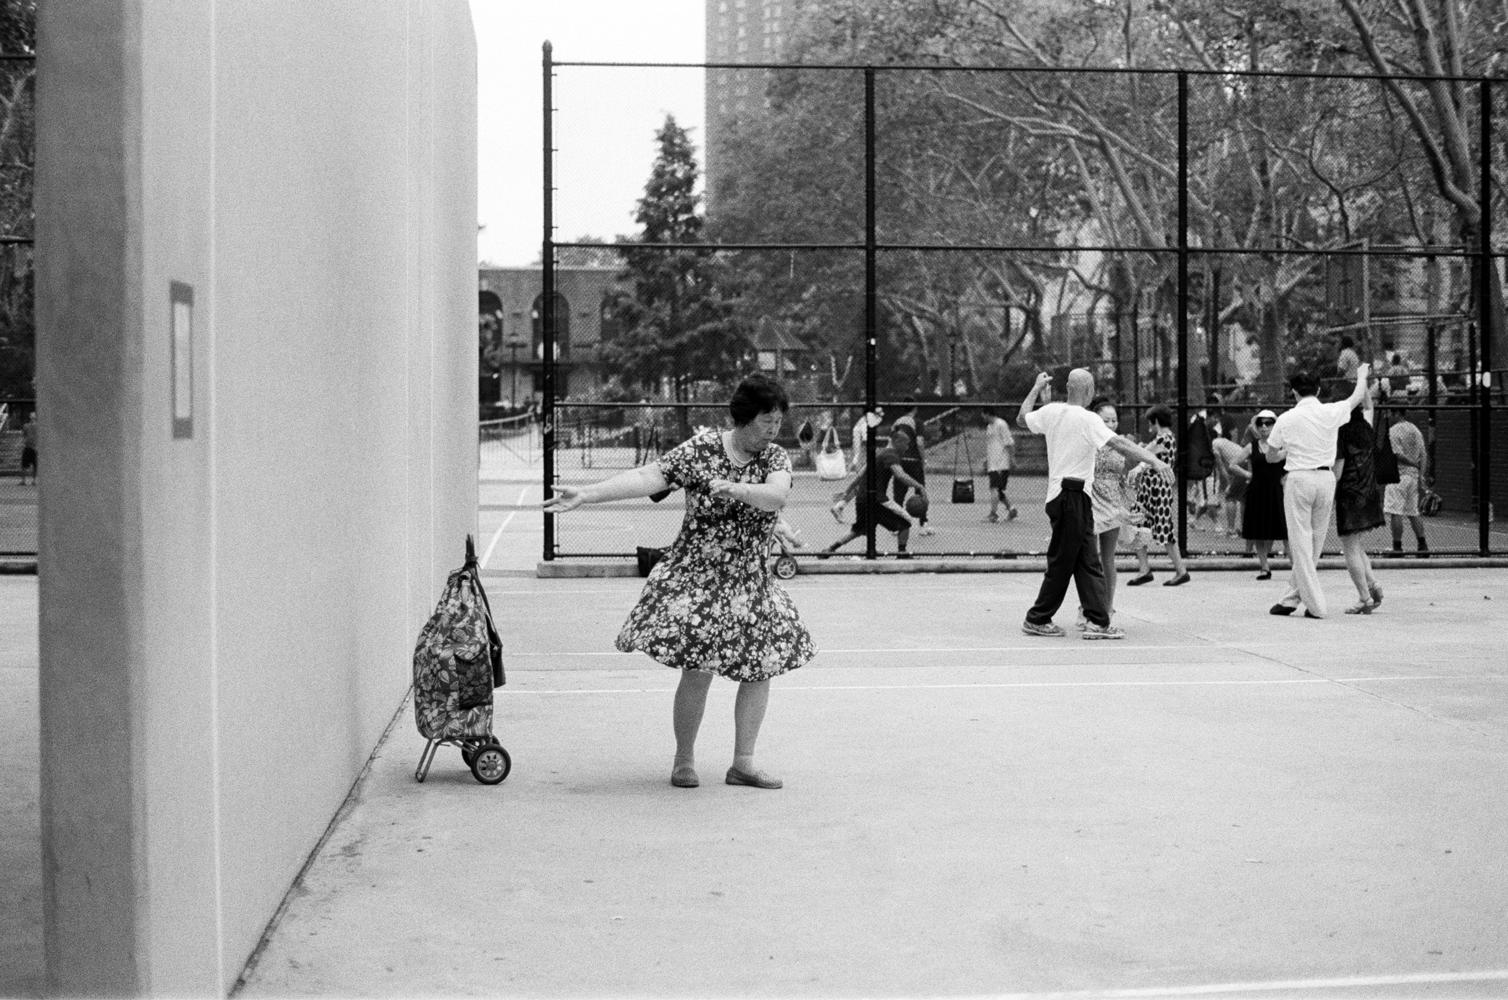 Shirley-Cai-Chinatown-8.png